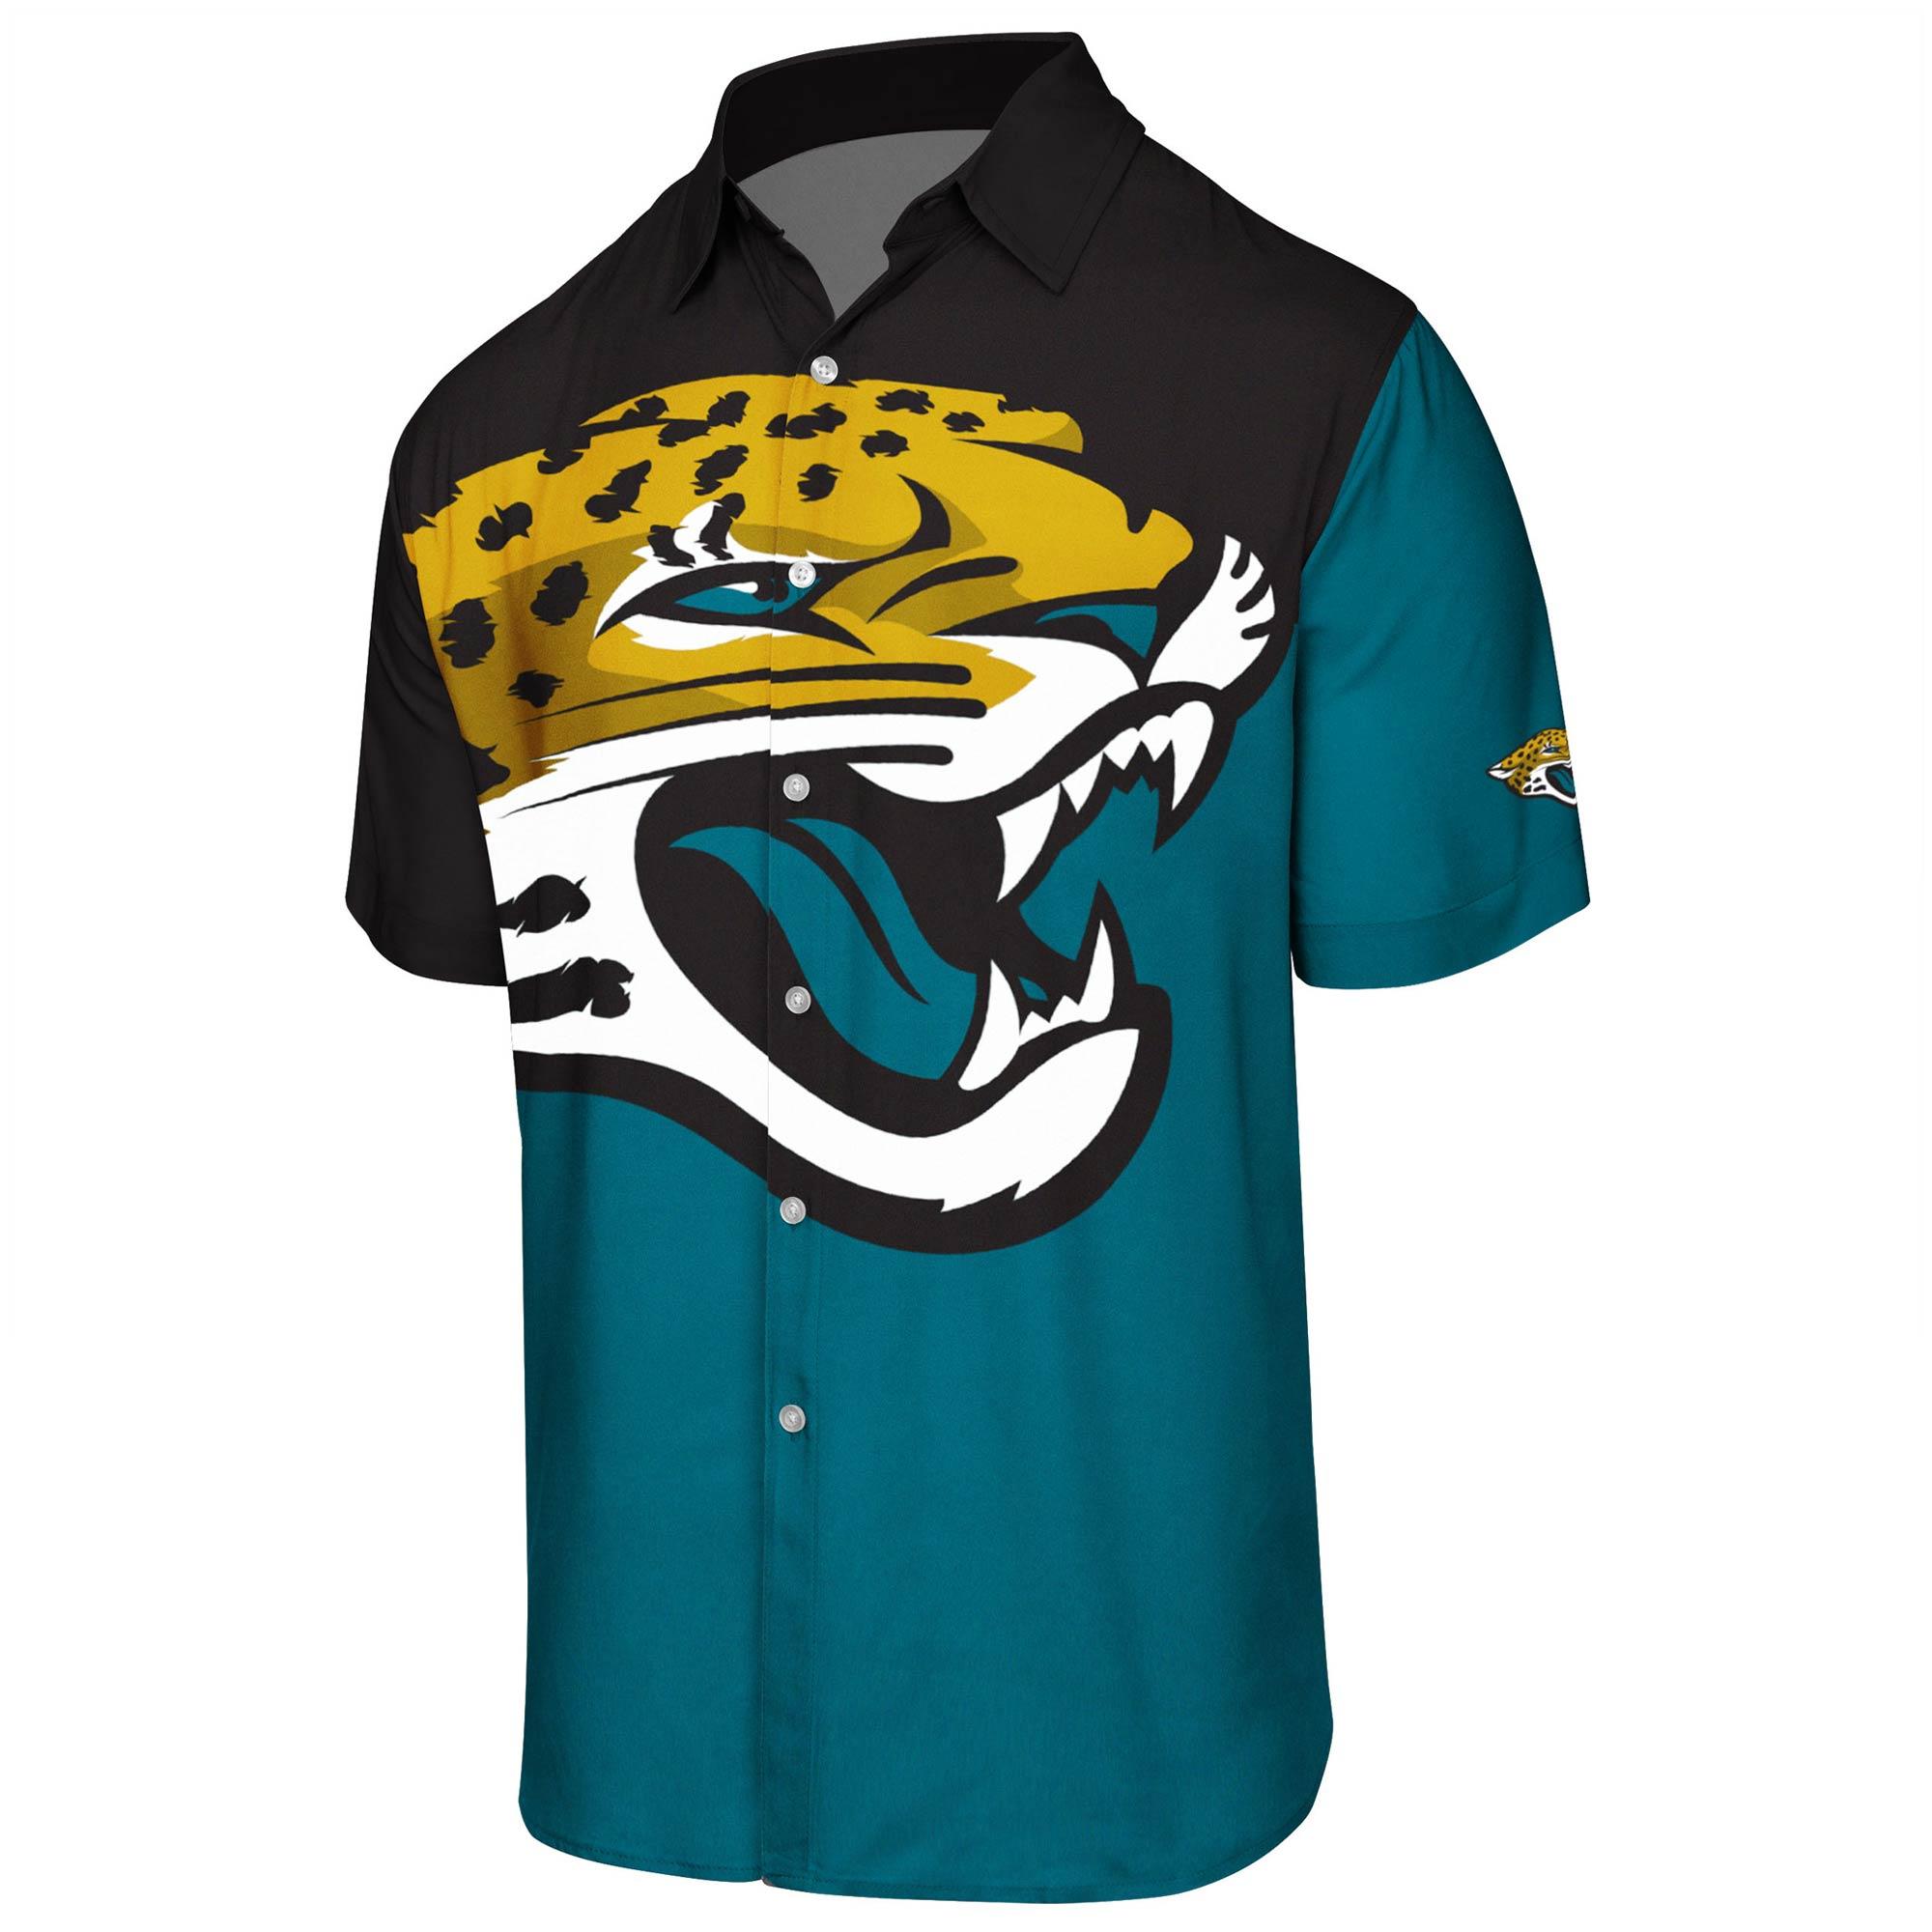 Jacksonville Jaguars Big Logo Button-Up Woven T-Shirt - Teal